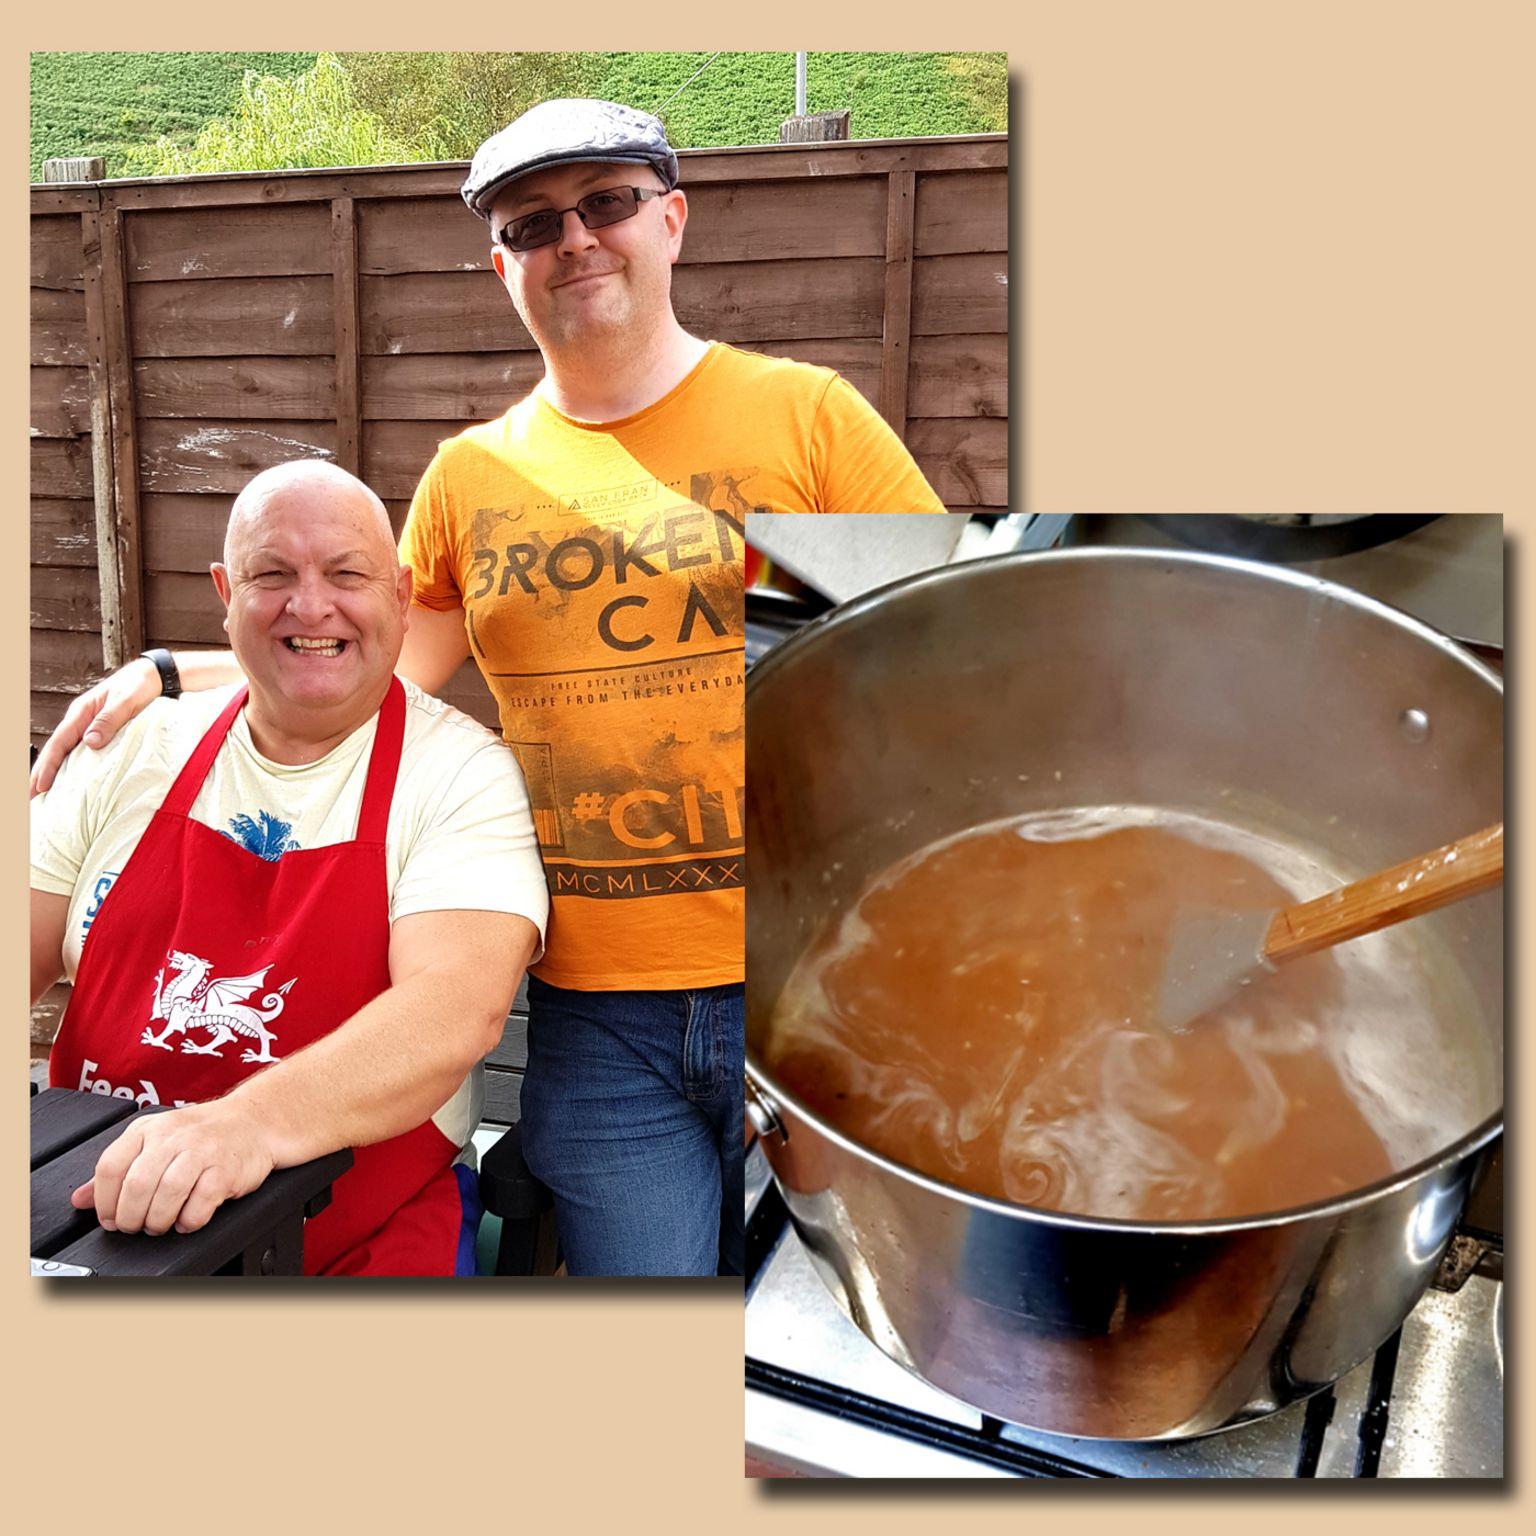 Peter and Dean Burnett, and a saucepan of Dean's gravy